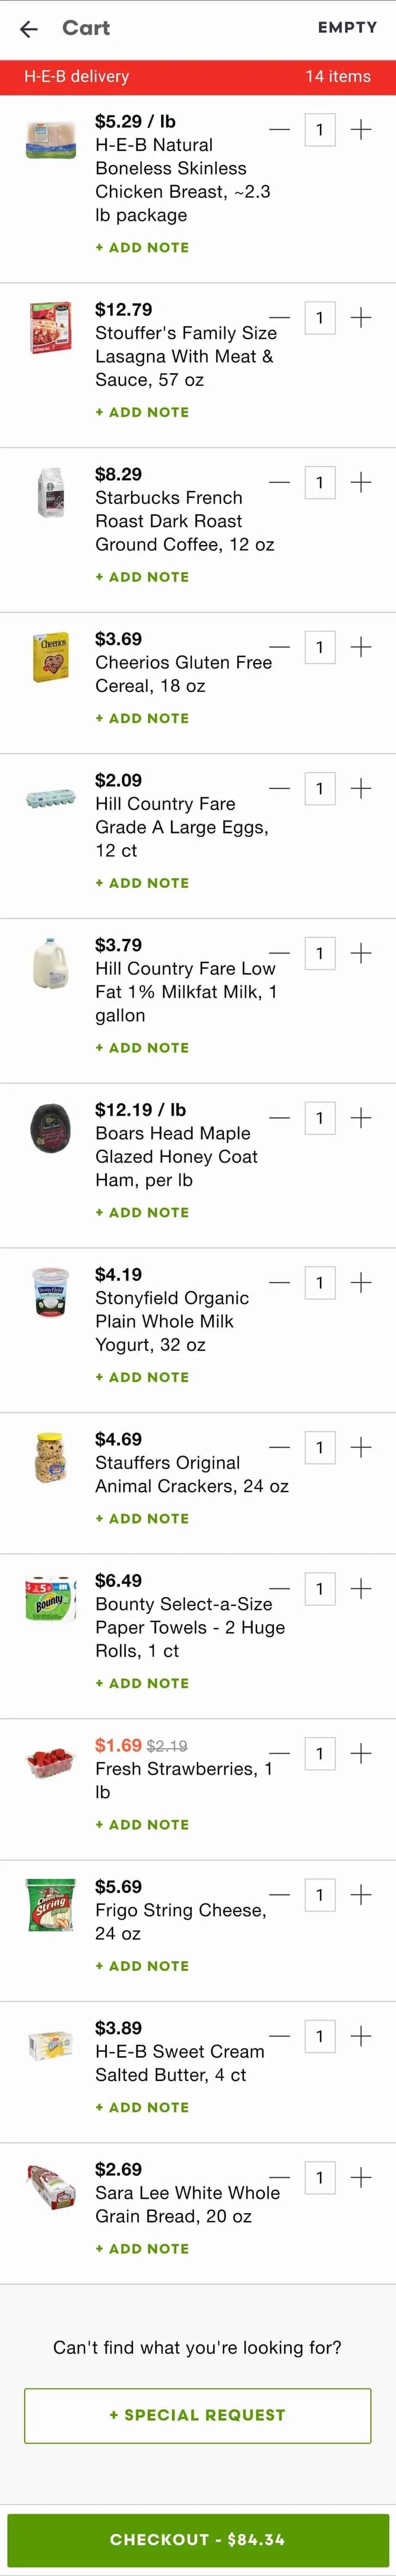 Shipt prices